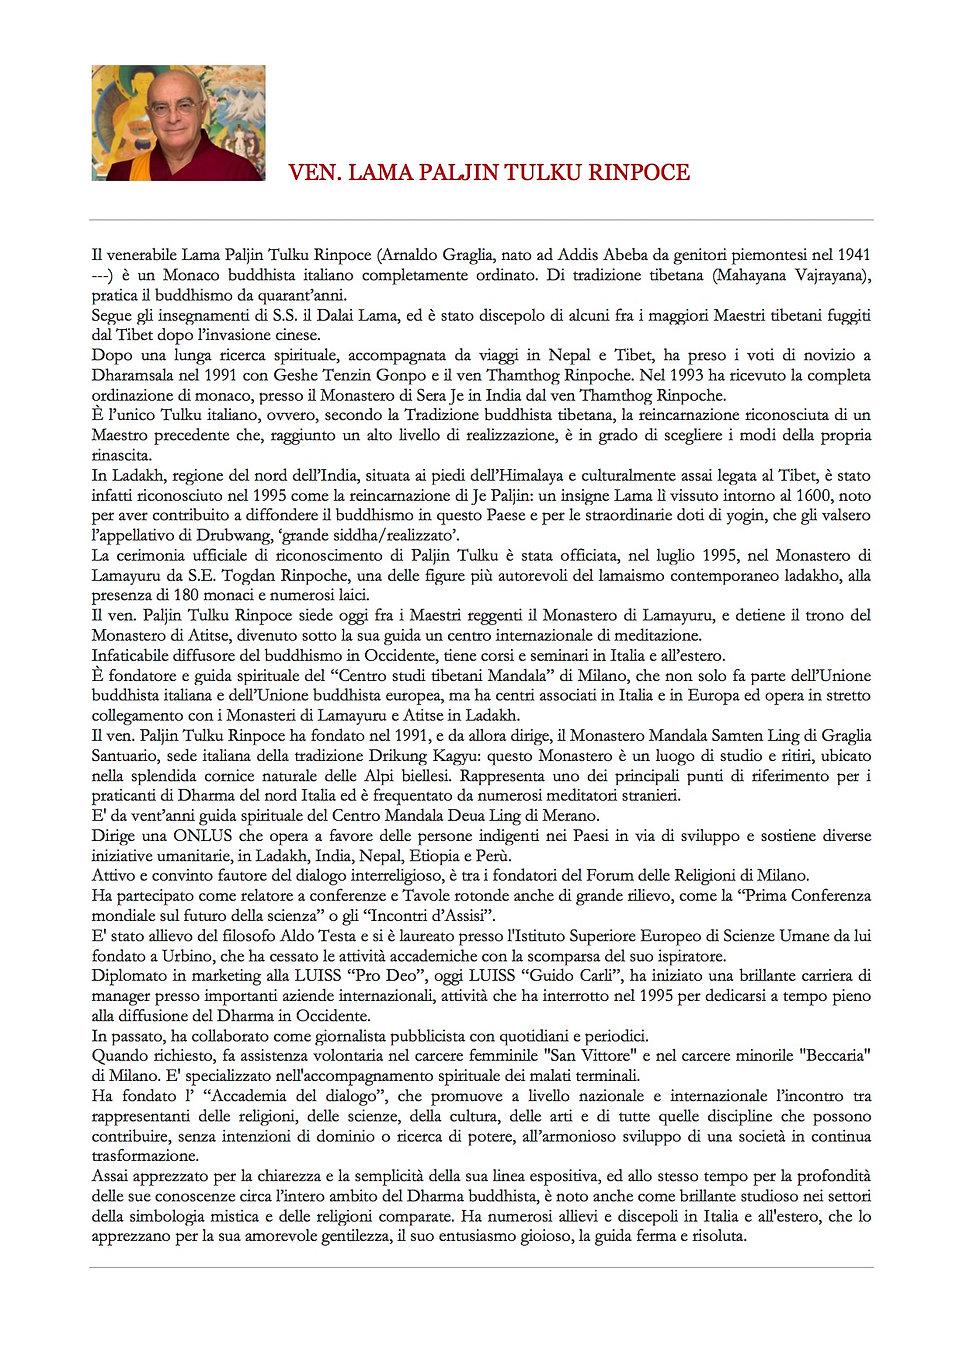 LAMA PALJIN TULKU RINPOCE profilo.jpg